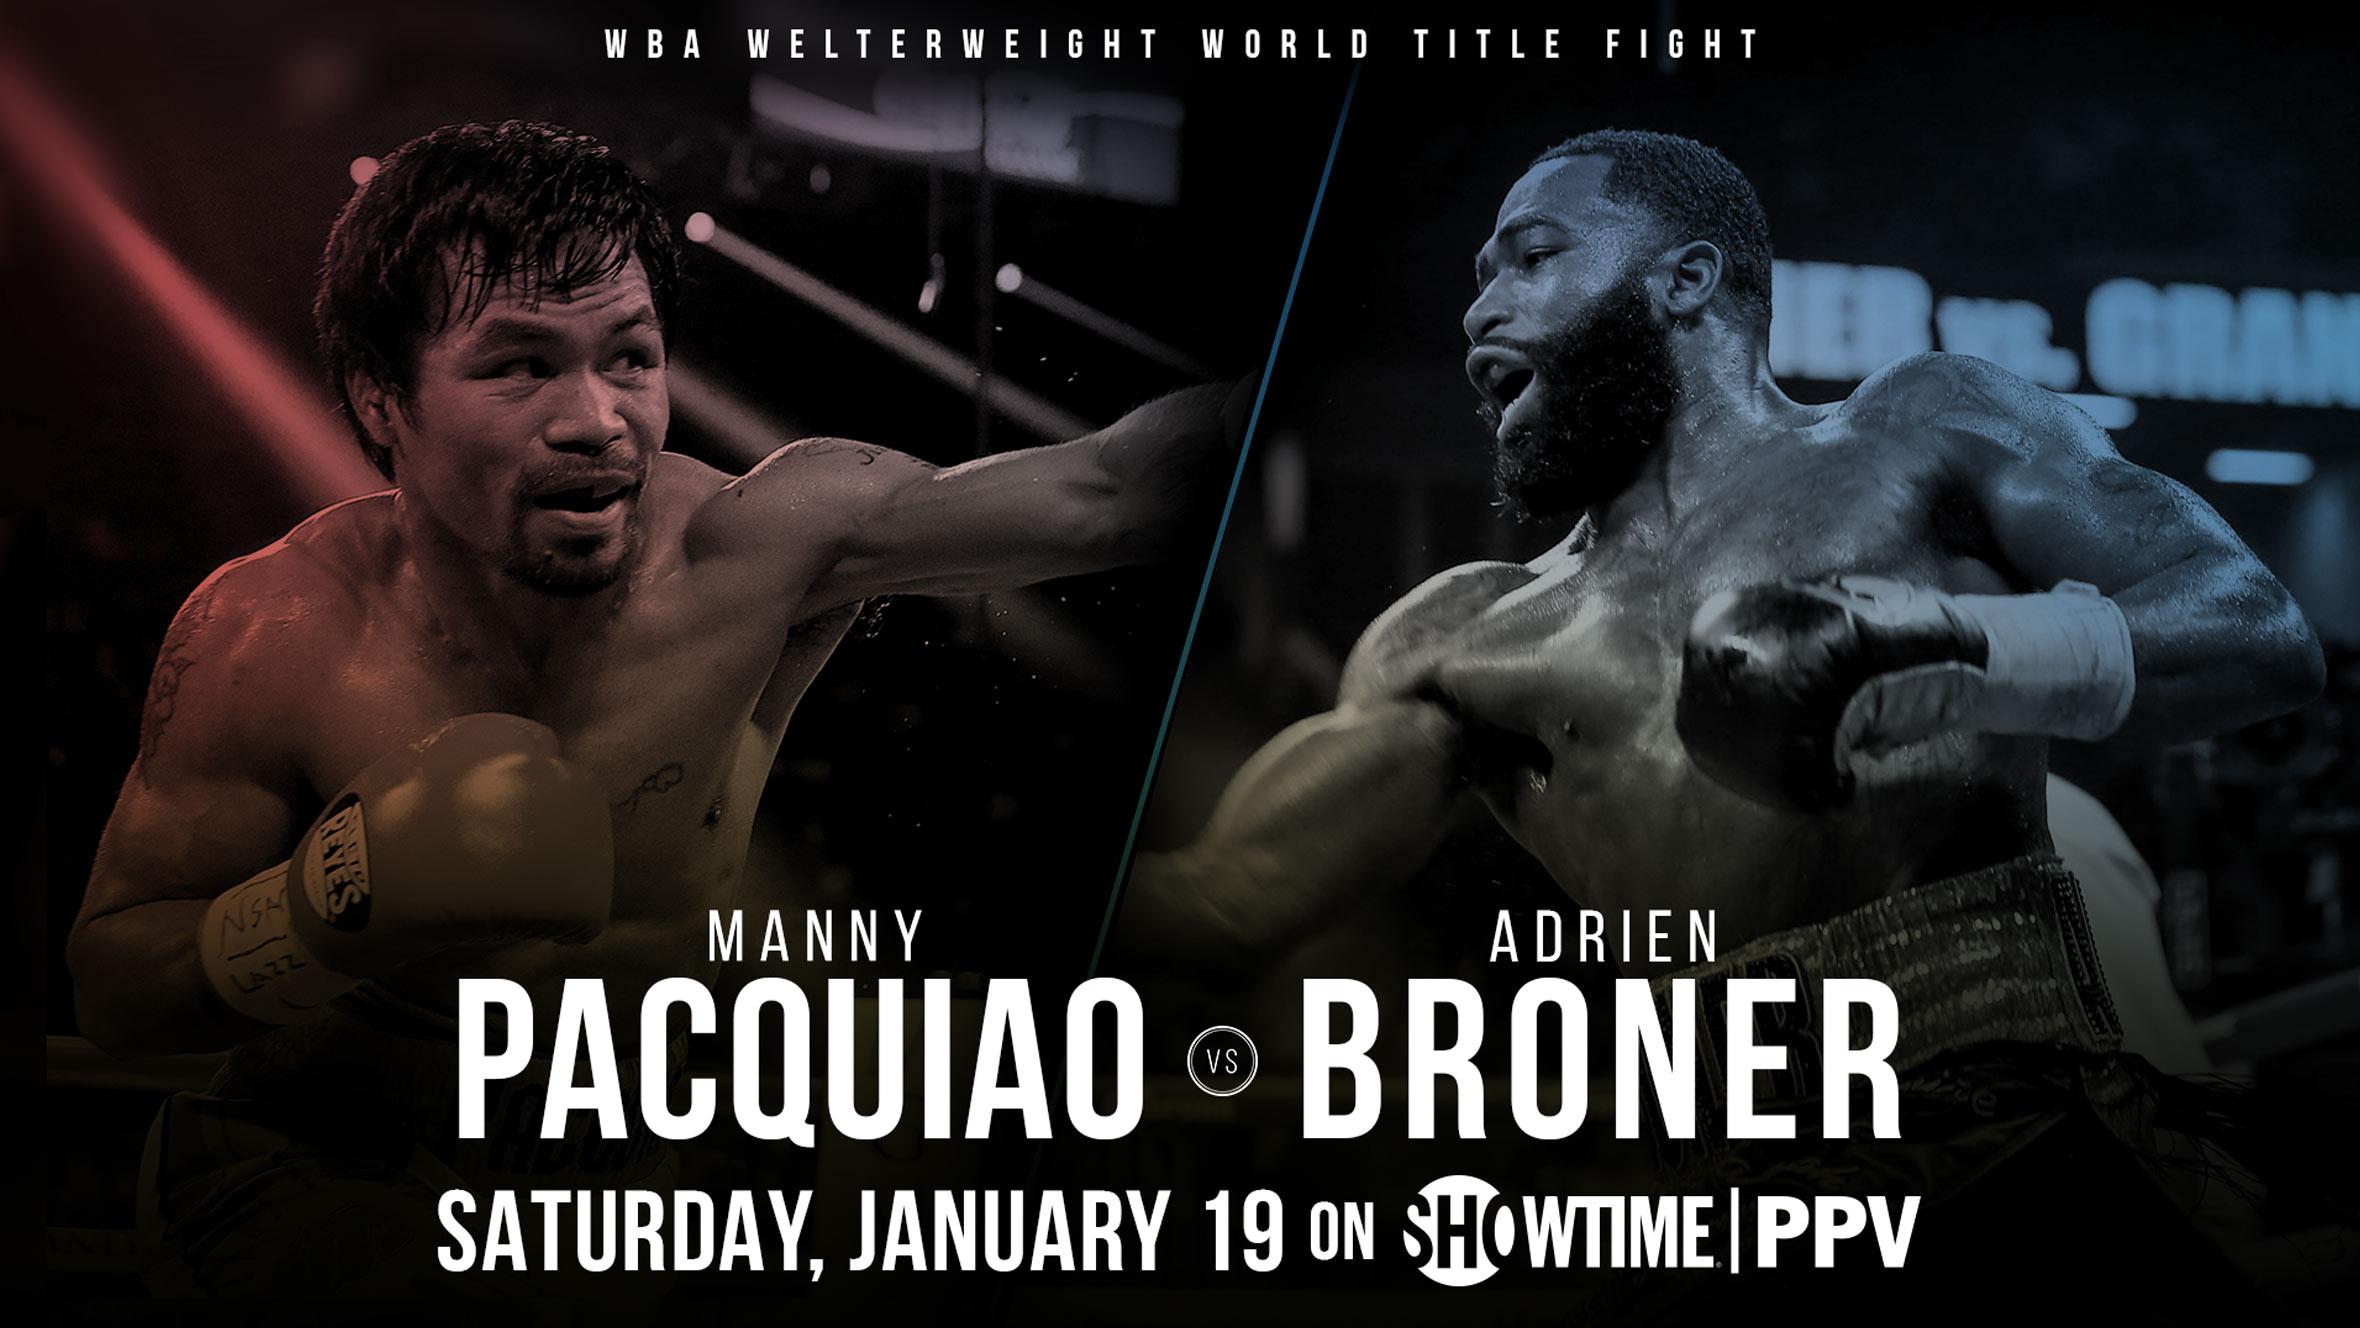 Cartel promocional para la pelea Pacquiao vs Broner